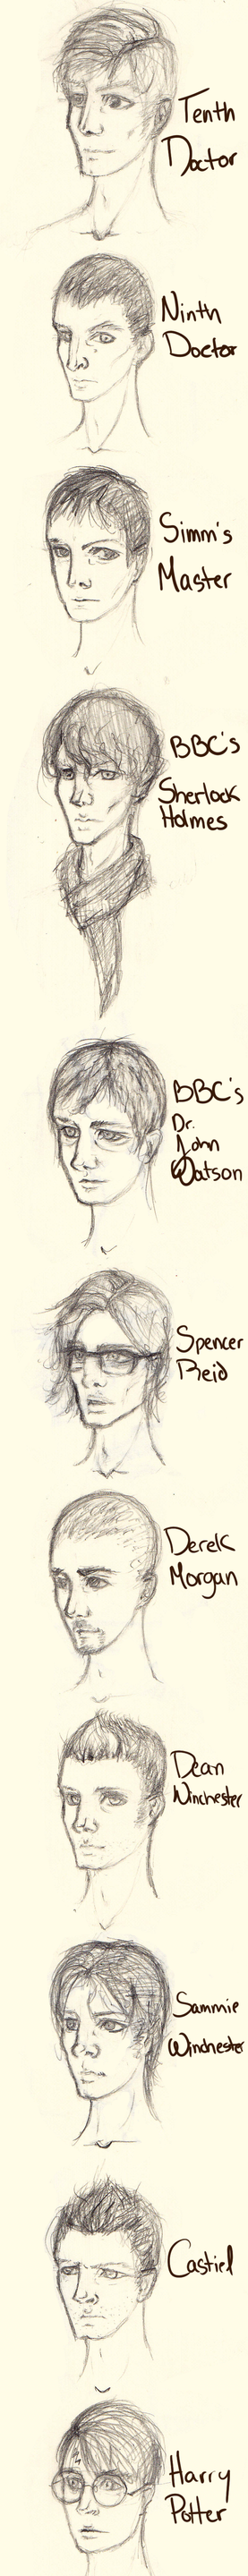 Headshot sketchdump by alexandravan5